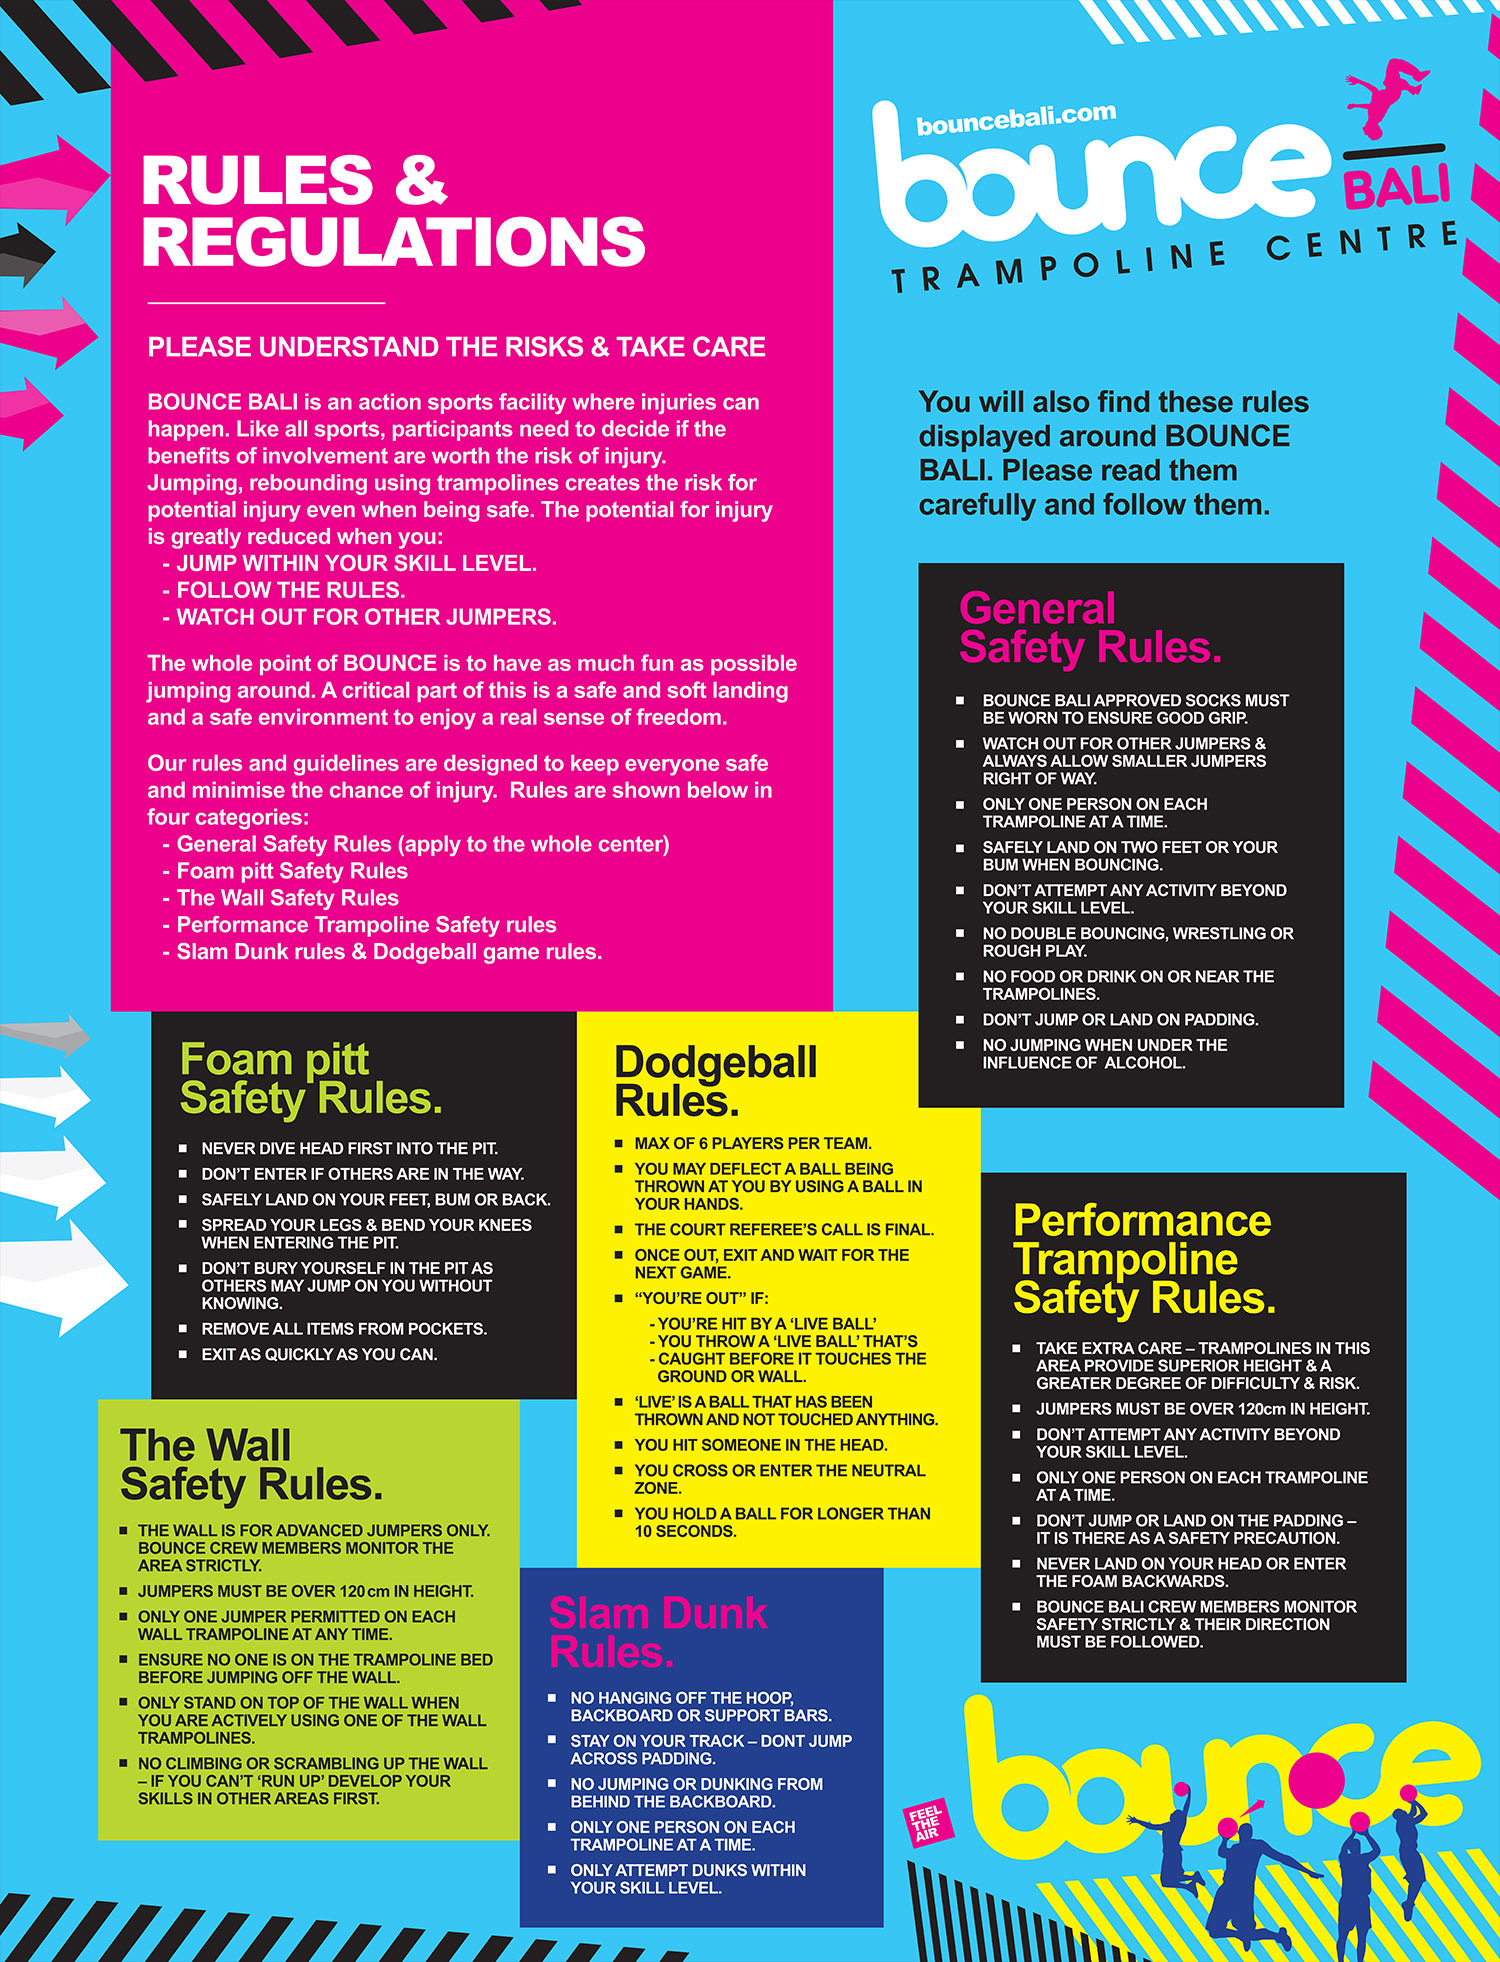 20140812-rules